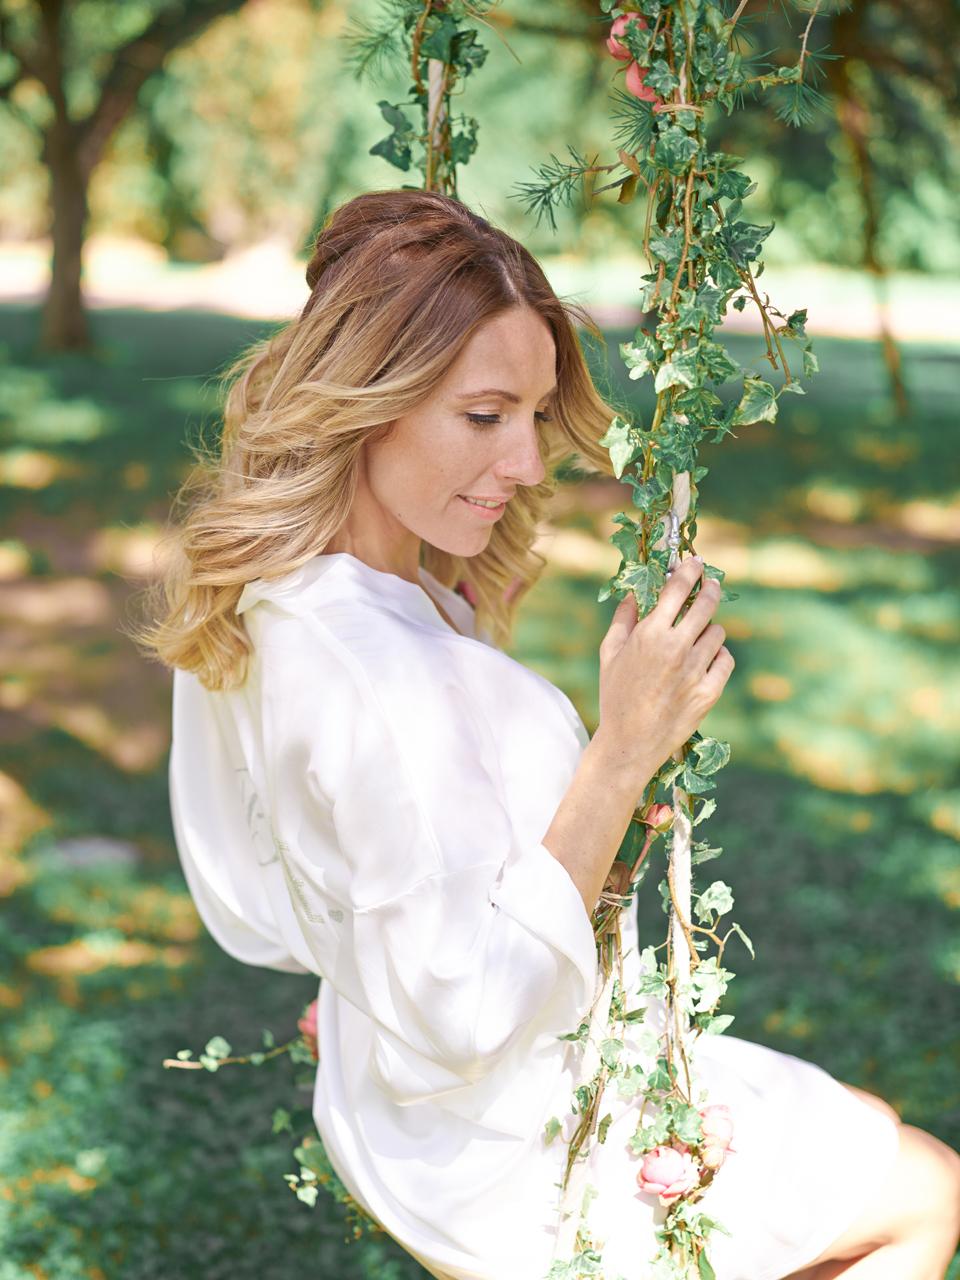 fashion-blogger-wedding-Monica-Sors (2)